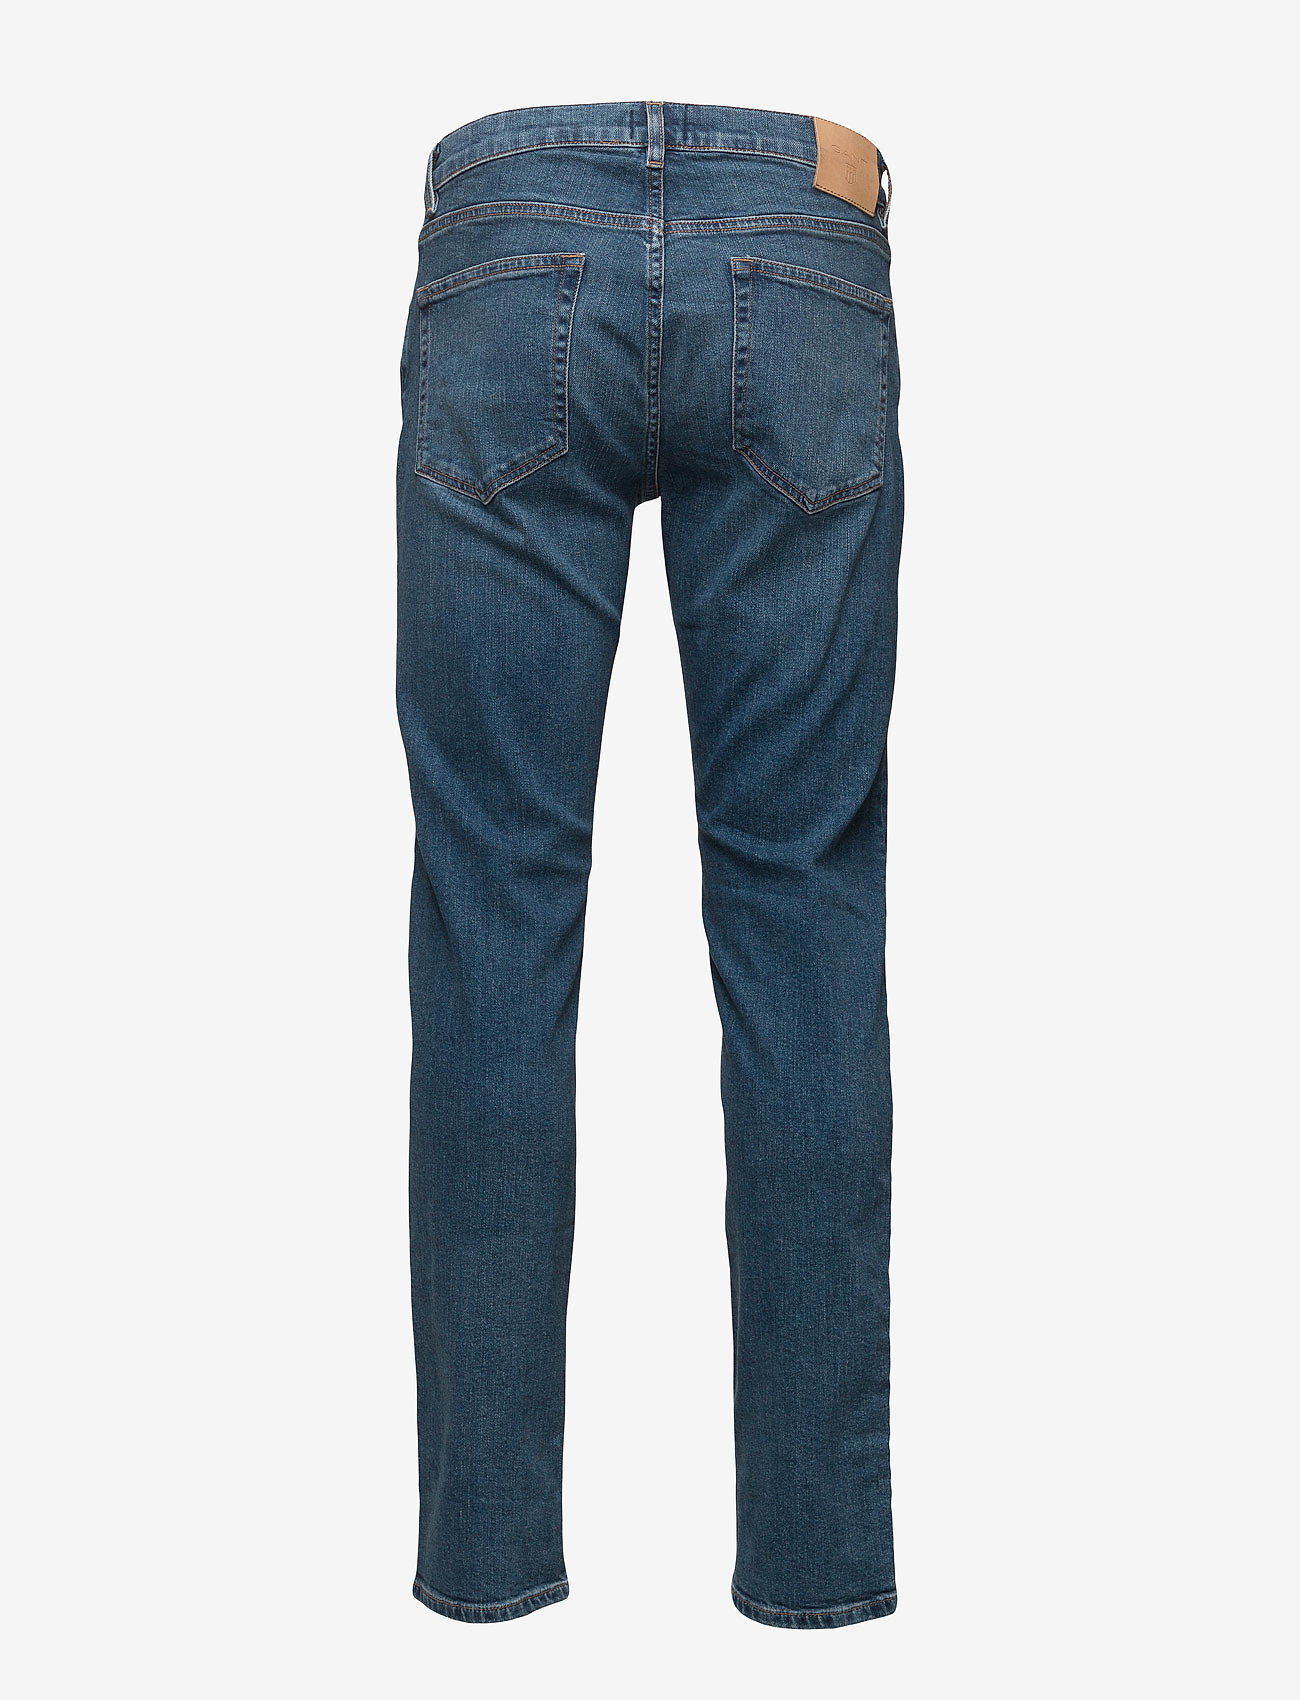 GANT - SLIM GANT JEANS - slim jeans - mid blue worn in - 1